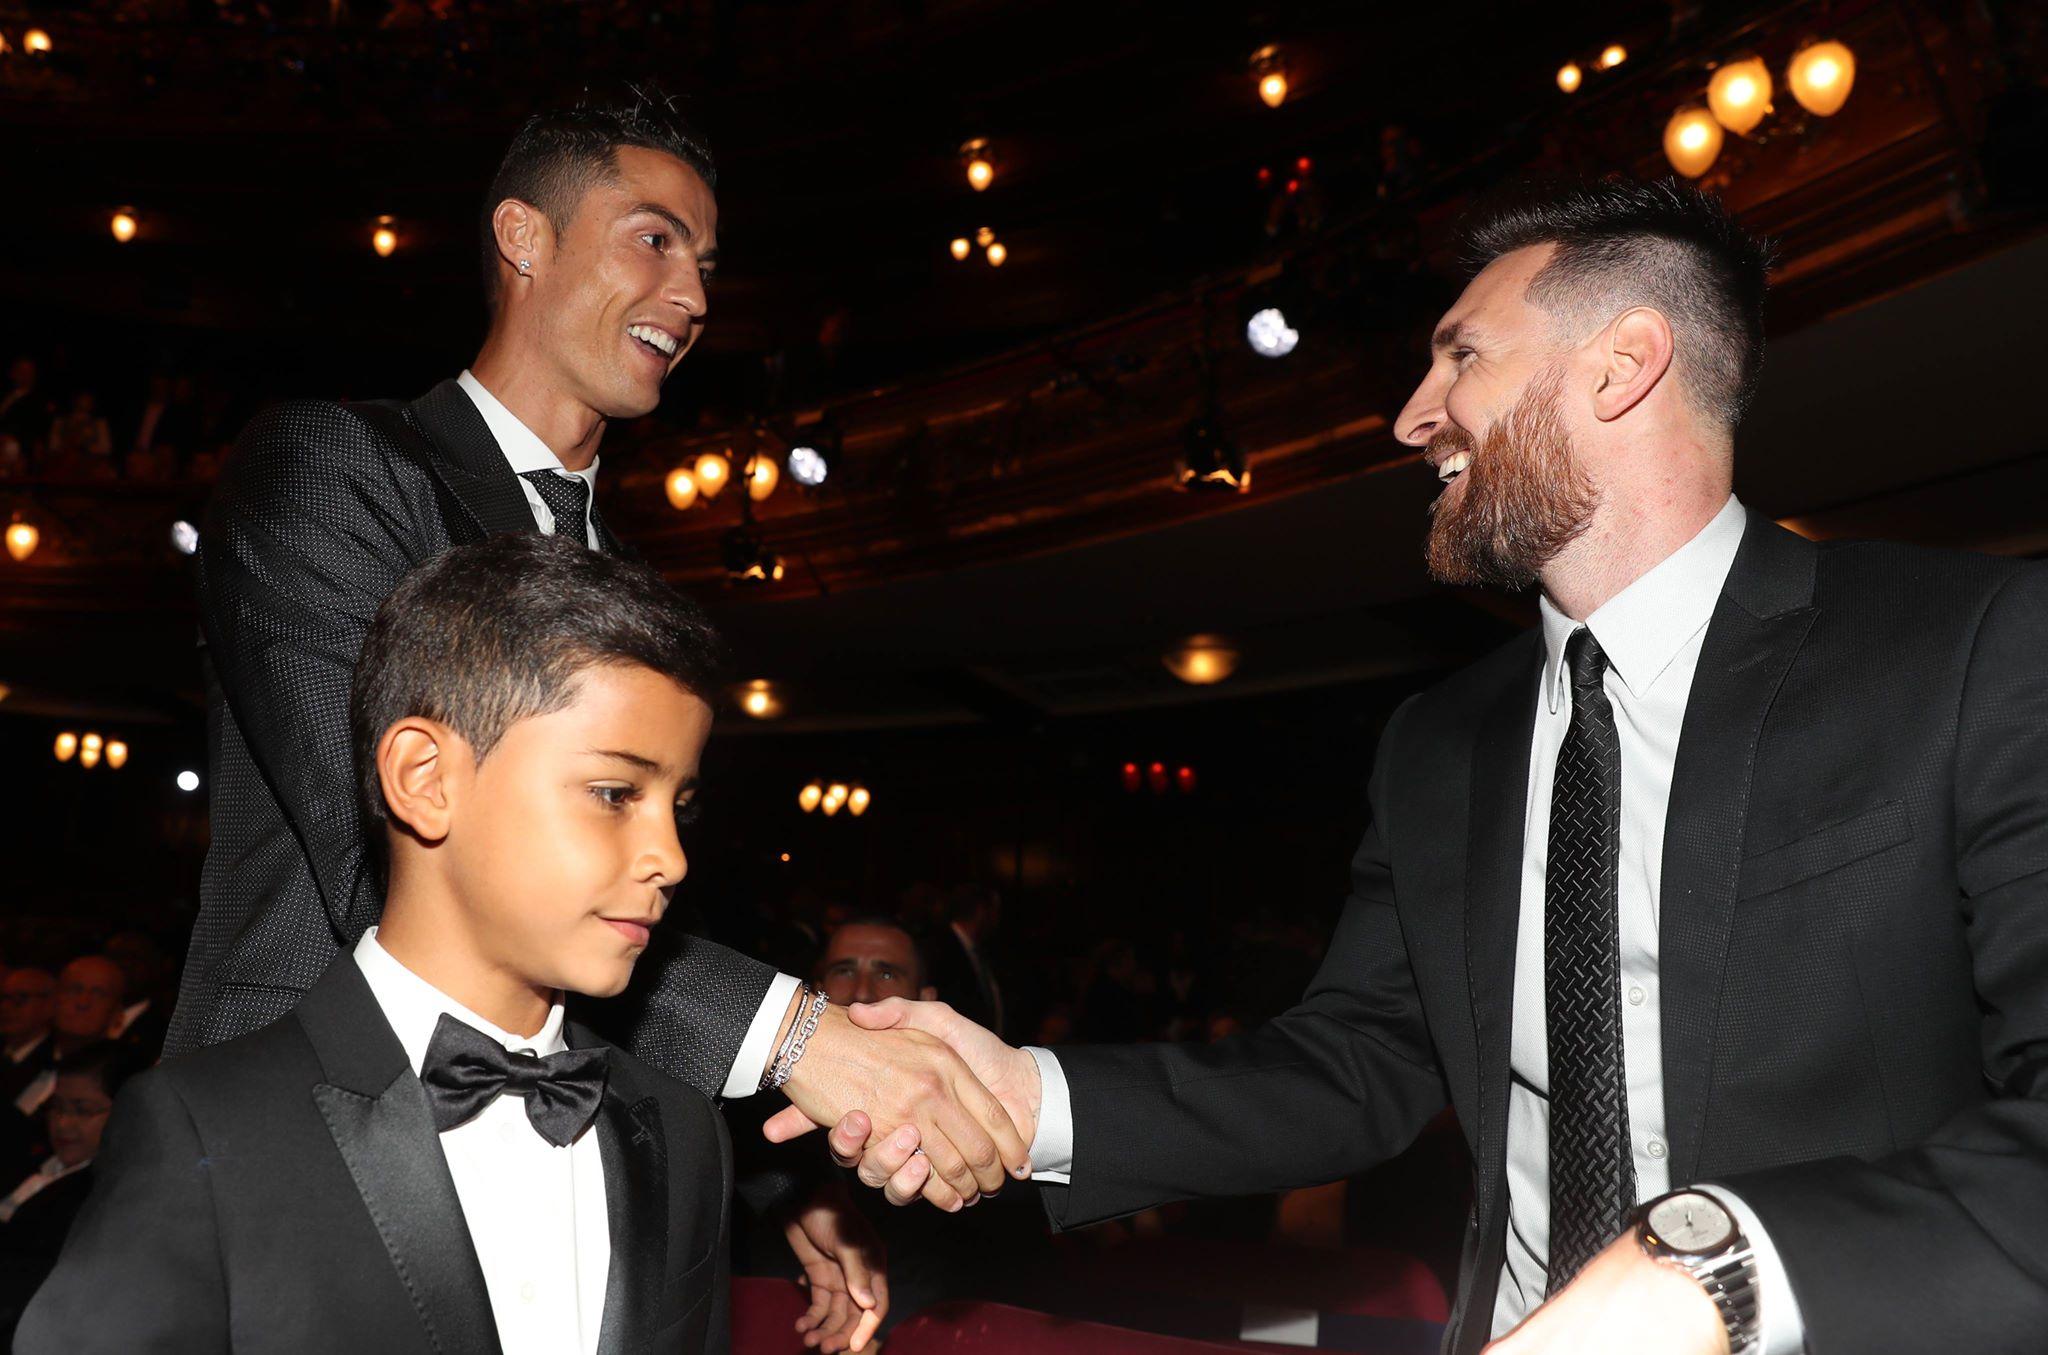 Cristiano Ronaldo wins FIFA's The Best award, edging Lionel Messi and Neymar